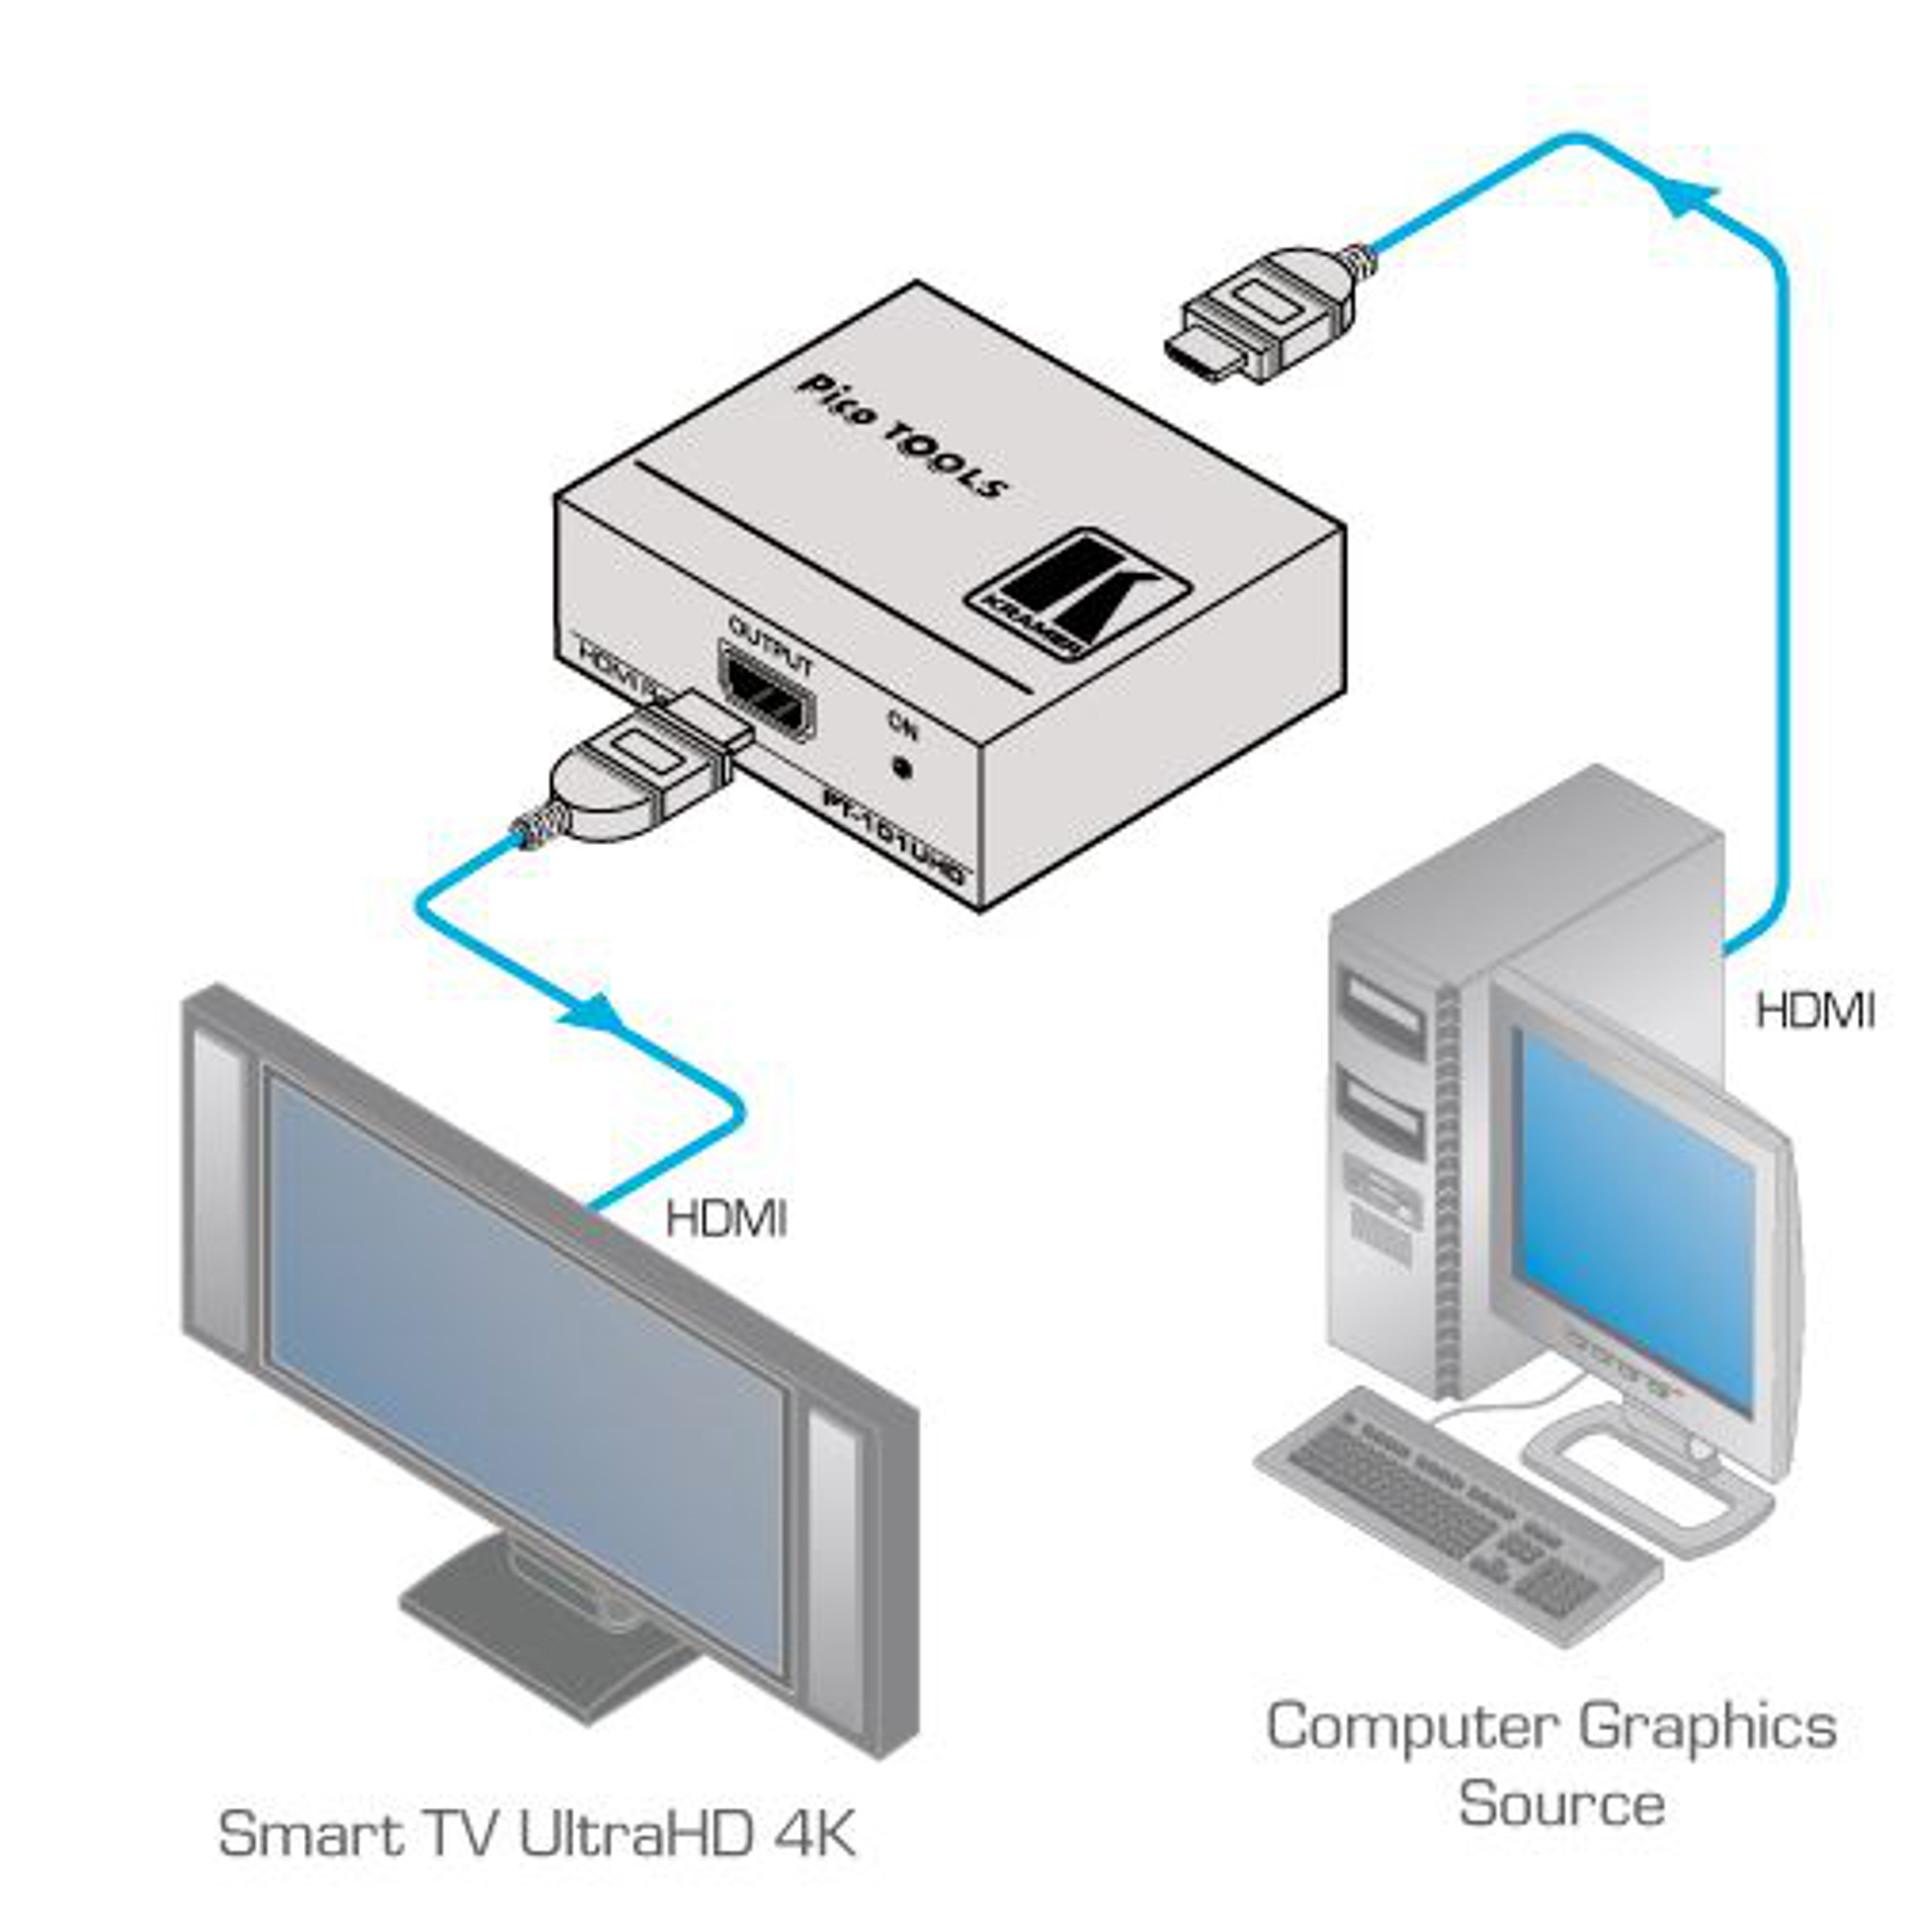 PT-101UHD - 4K UHD HDMI Repeater - Kramer - BellEquip